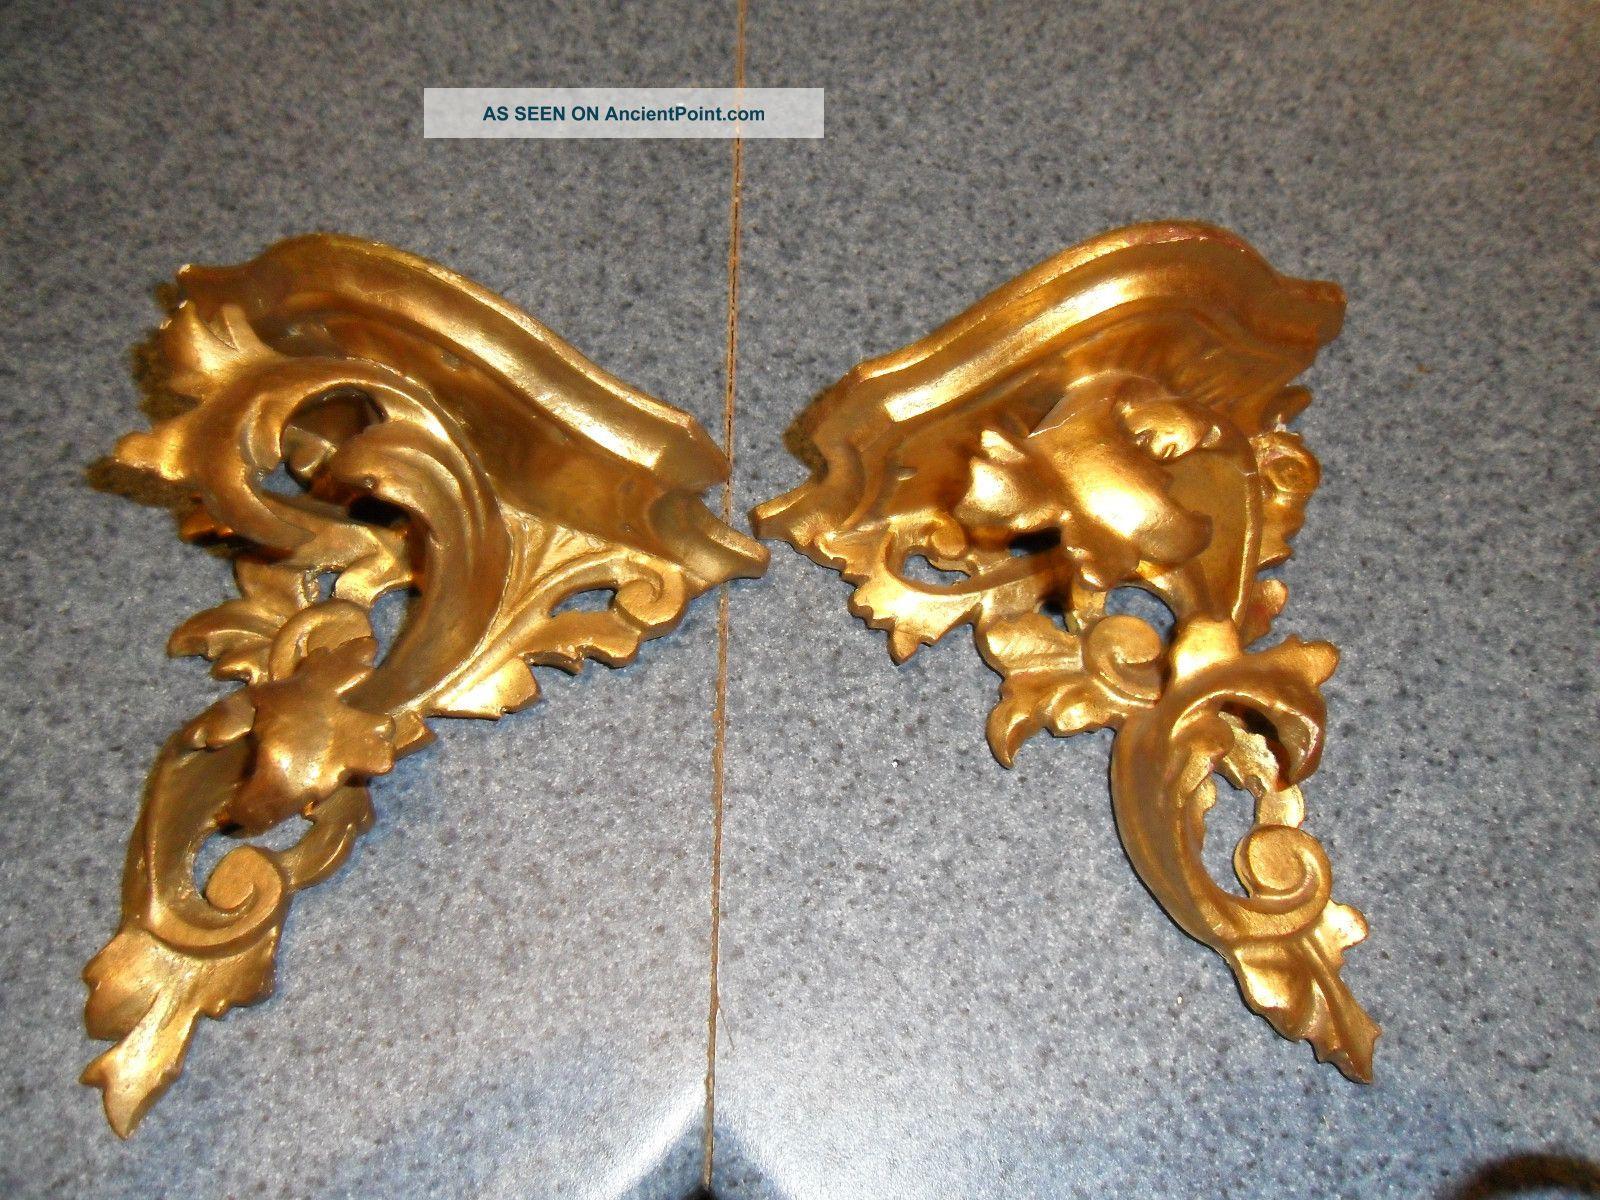 Pair Antique Sconces Ornate Italian Florentine Gold Leaf Gilt Wood